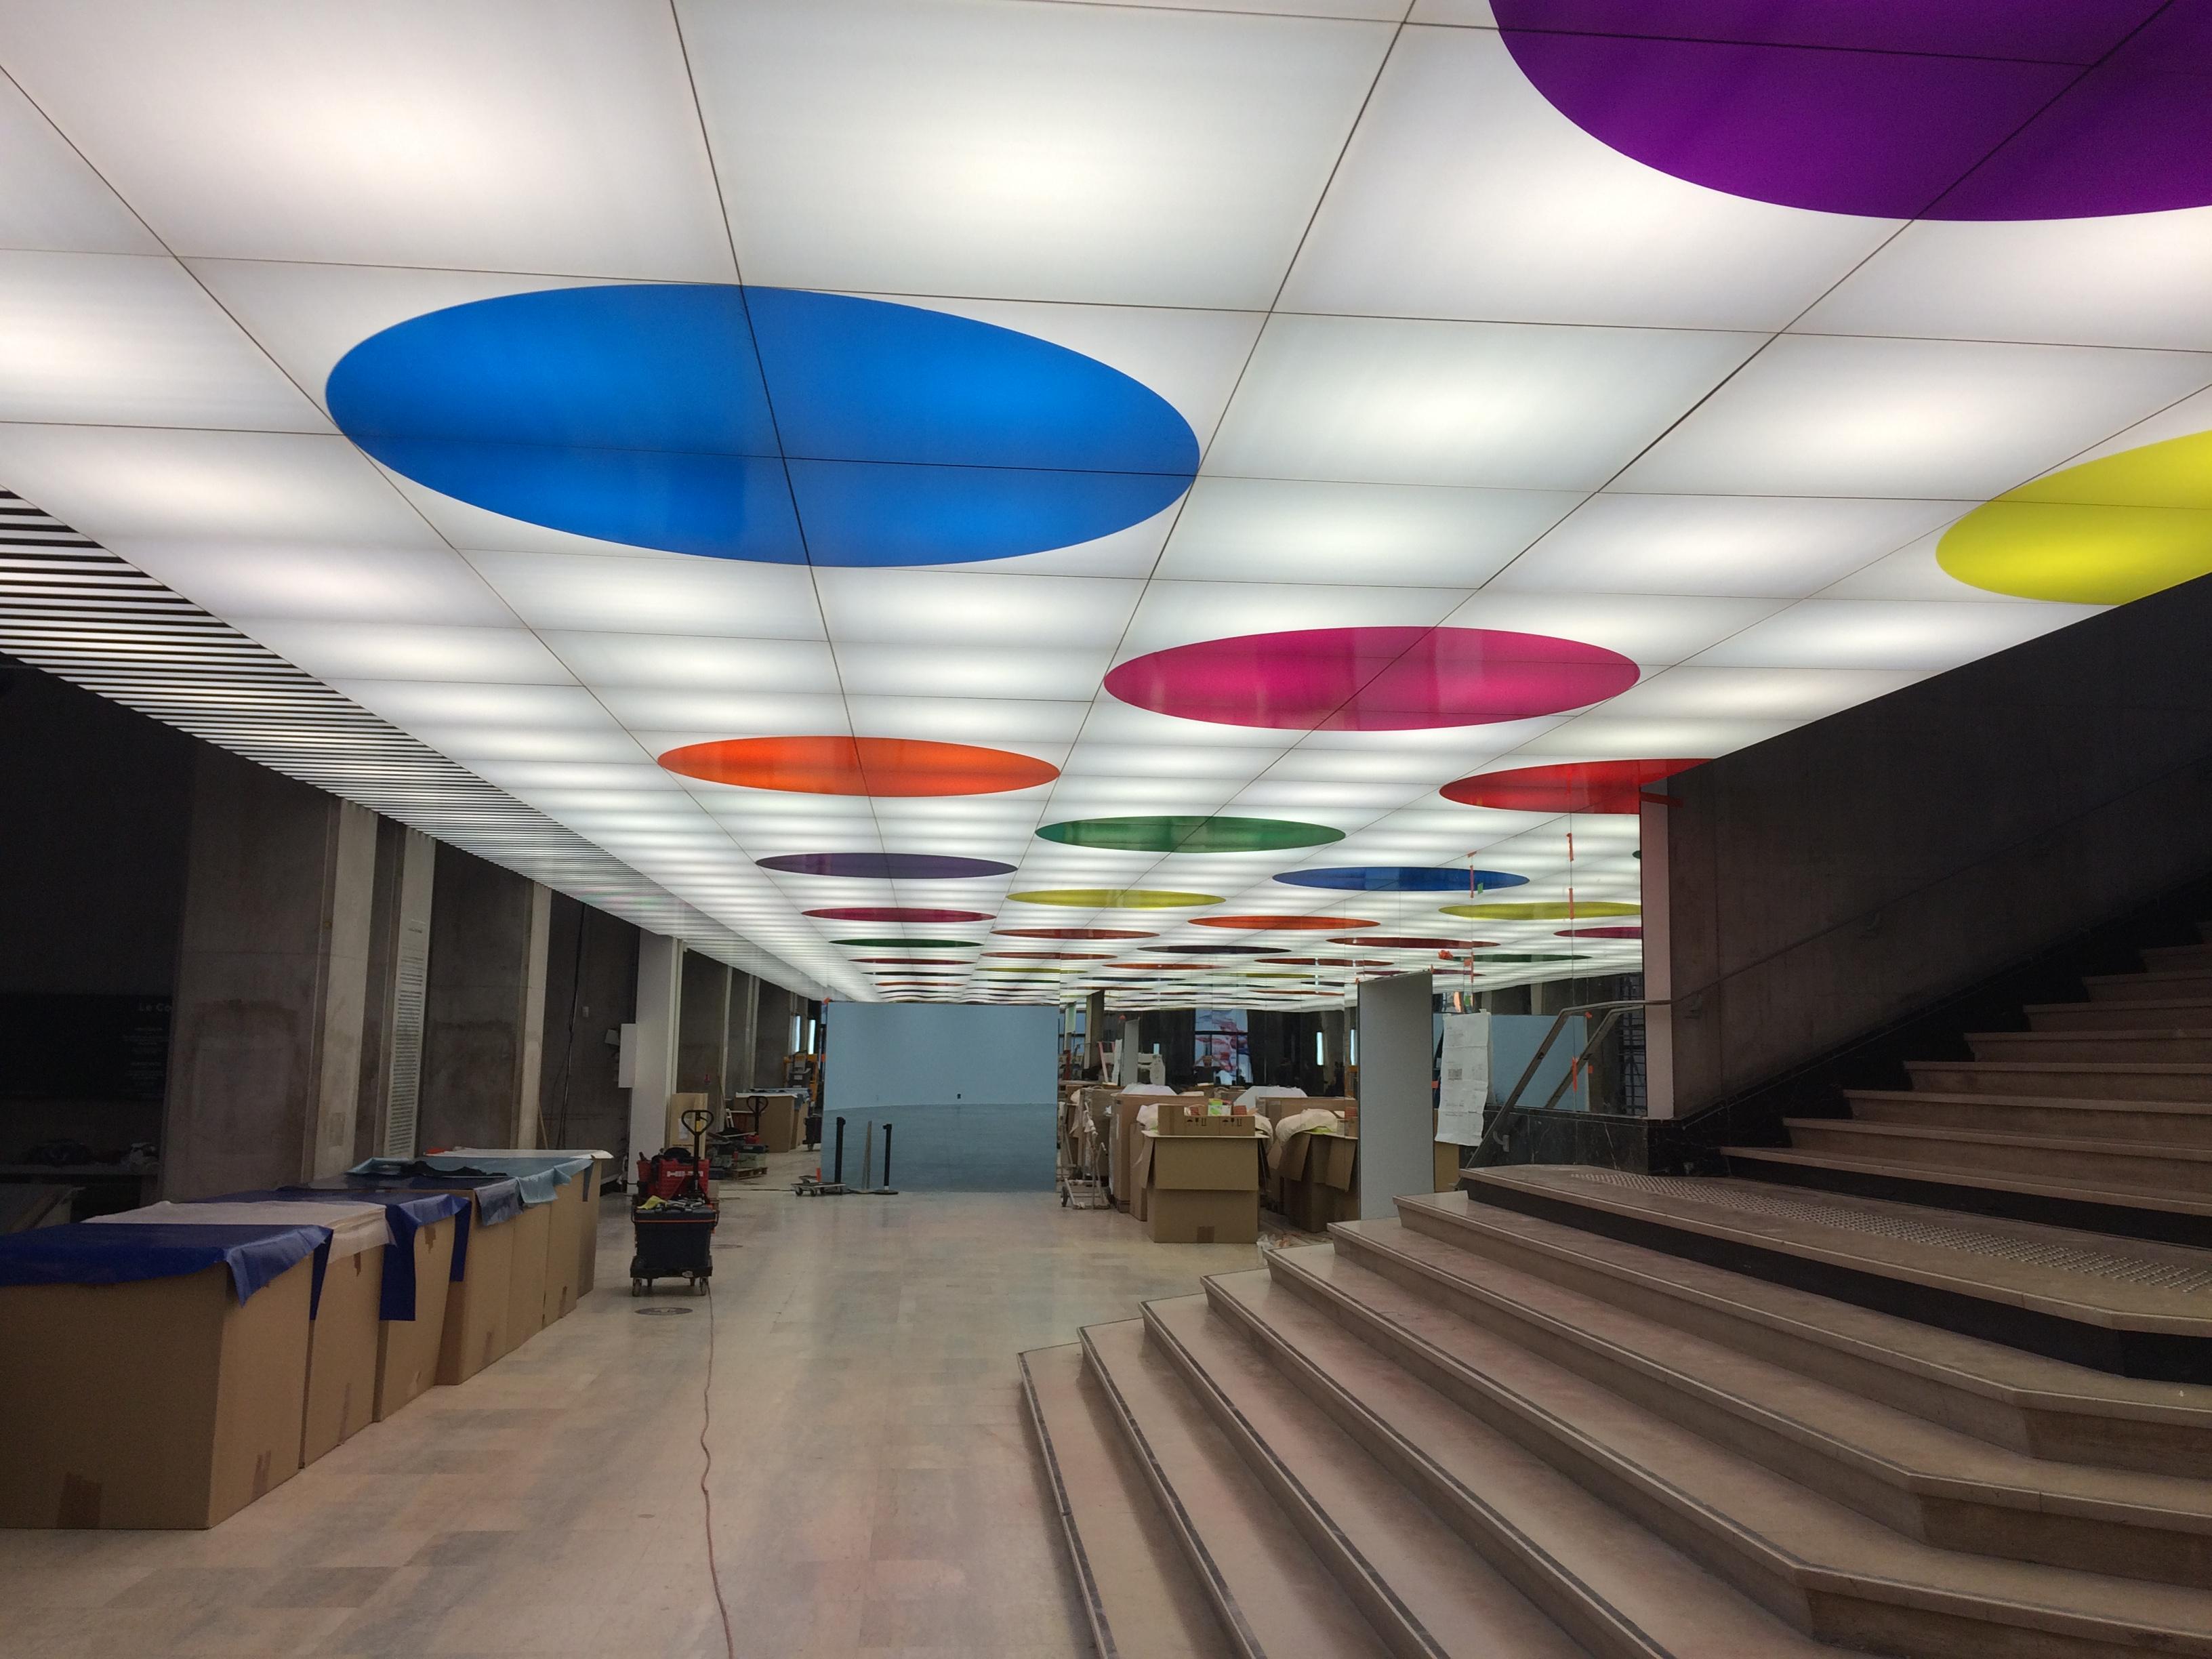 Plafond suspendu D. BURREN, Palais de Tokyo 2016, Paris